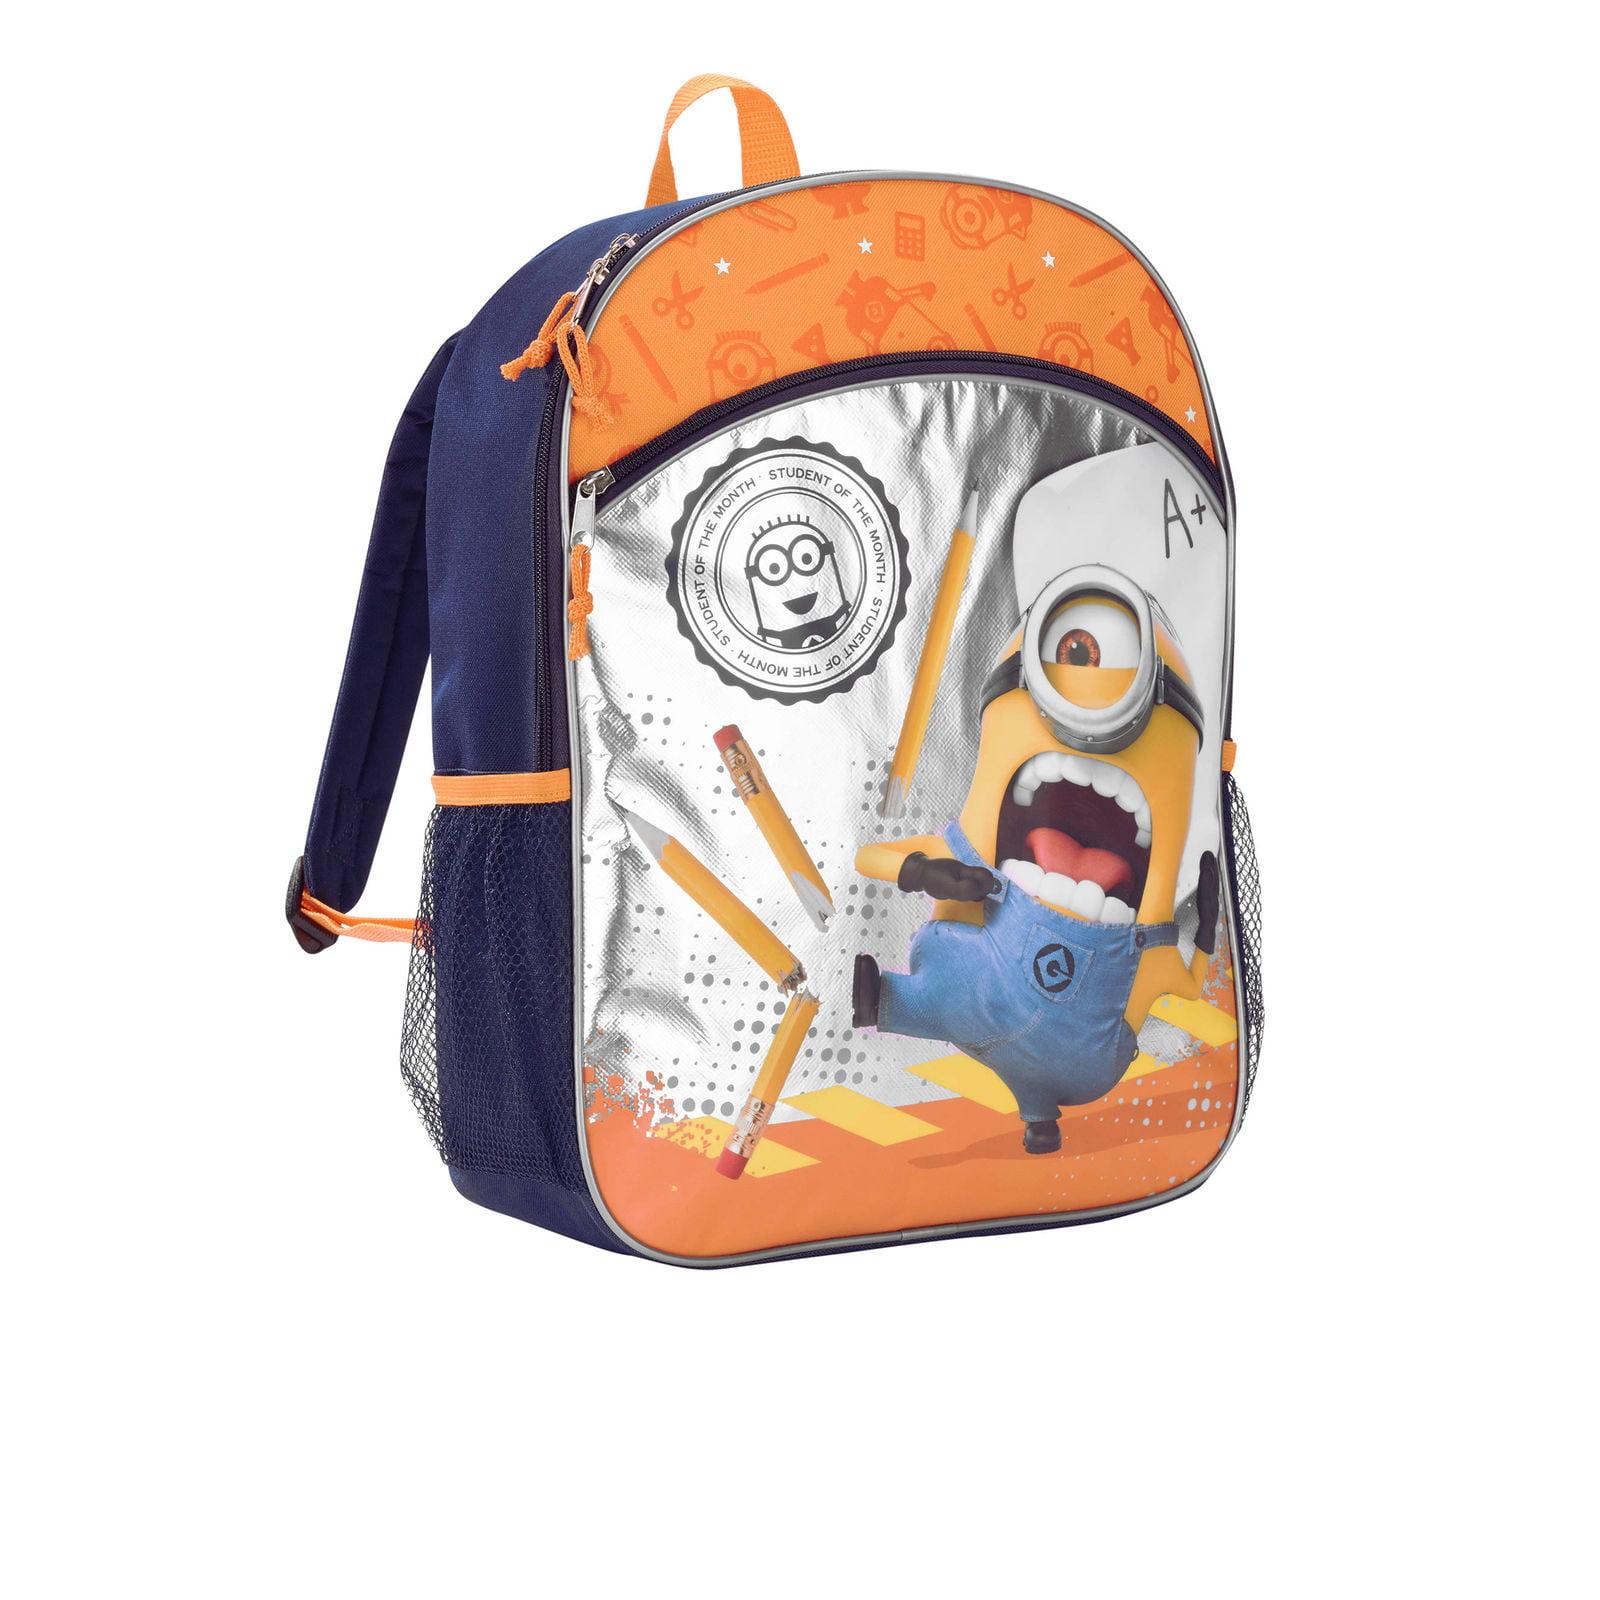 Despicable Me Minion 16'' Metallic Foil Front Pocket Kids Backpack